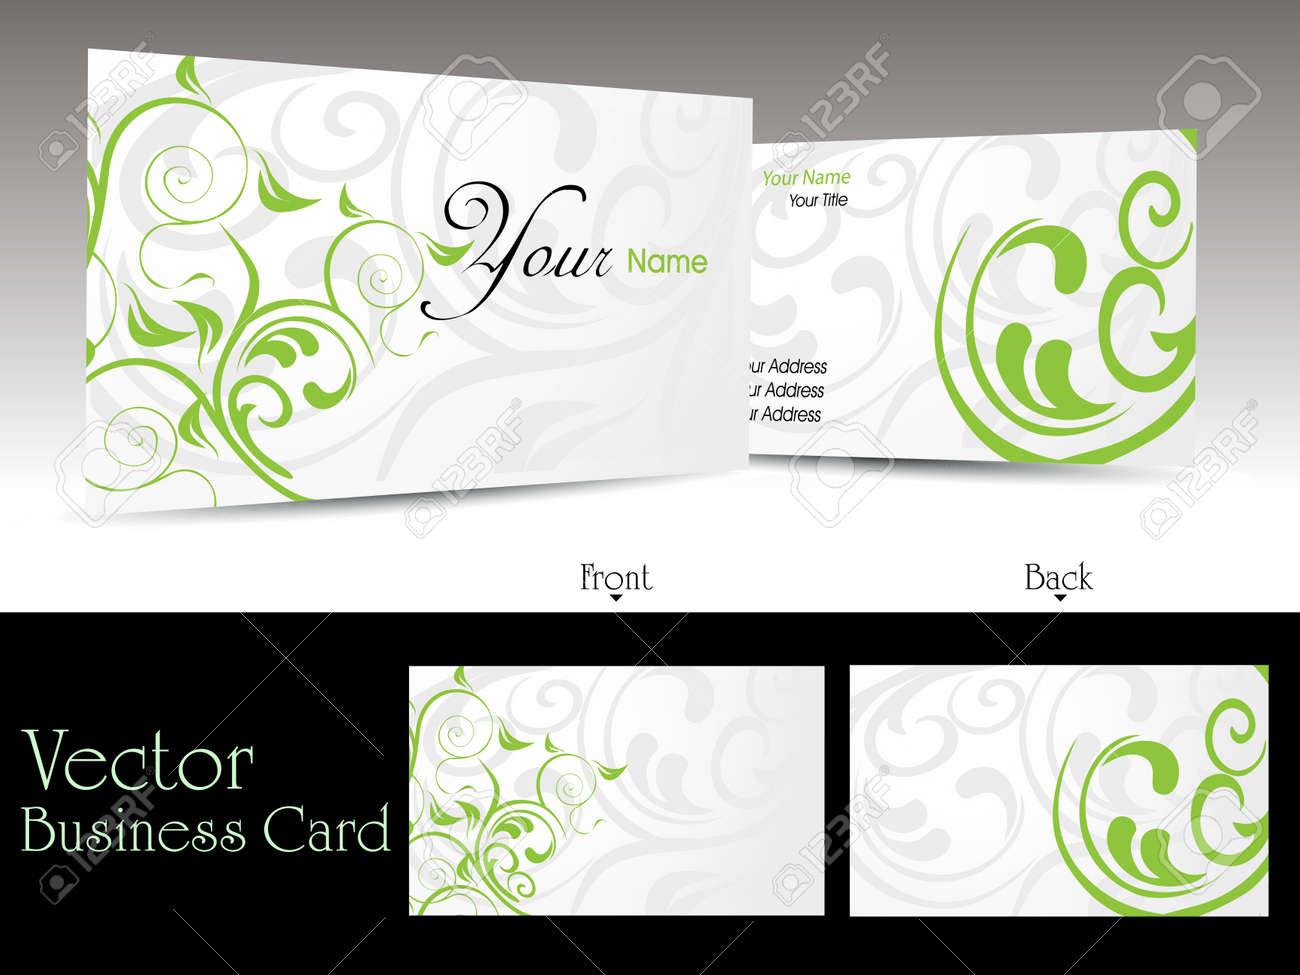 vector set of elegant floral pattern business cards or gift cards - 11895144